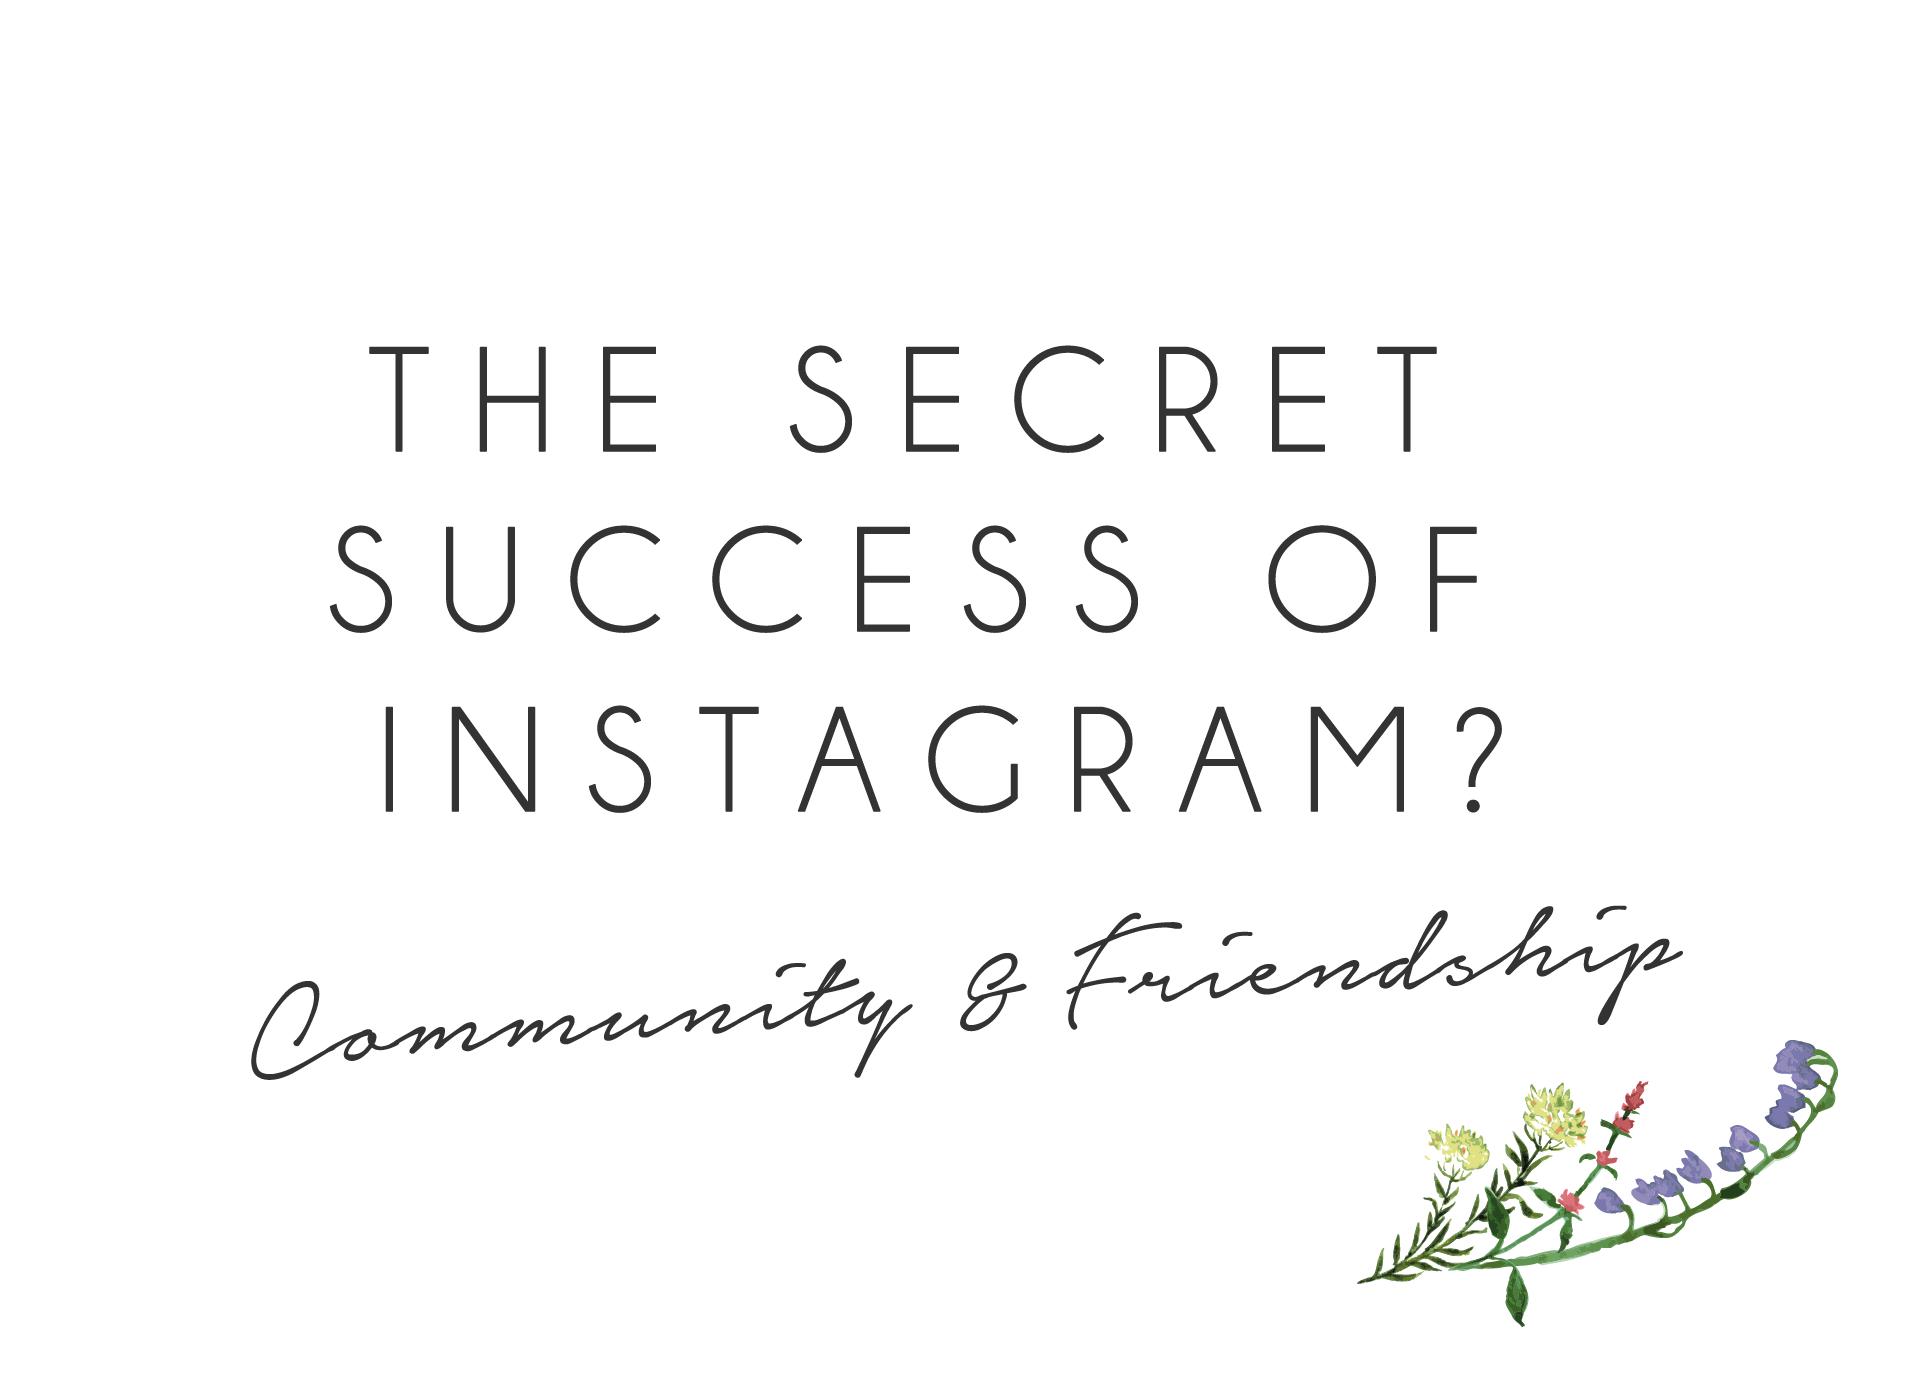 The secret success of Instagram? Community and friendship.